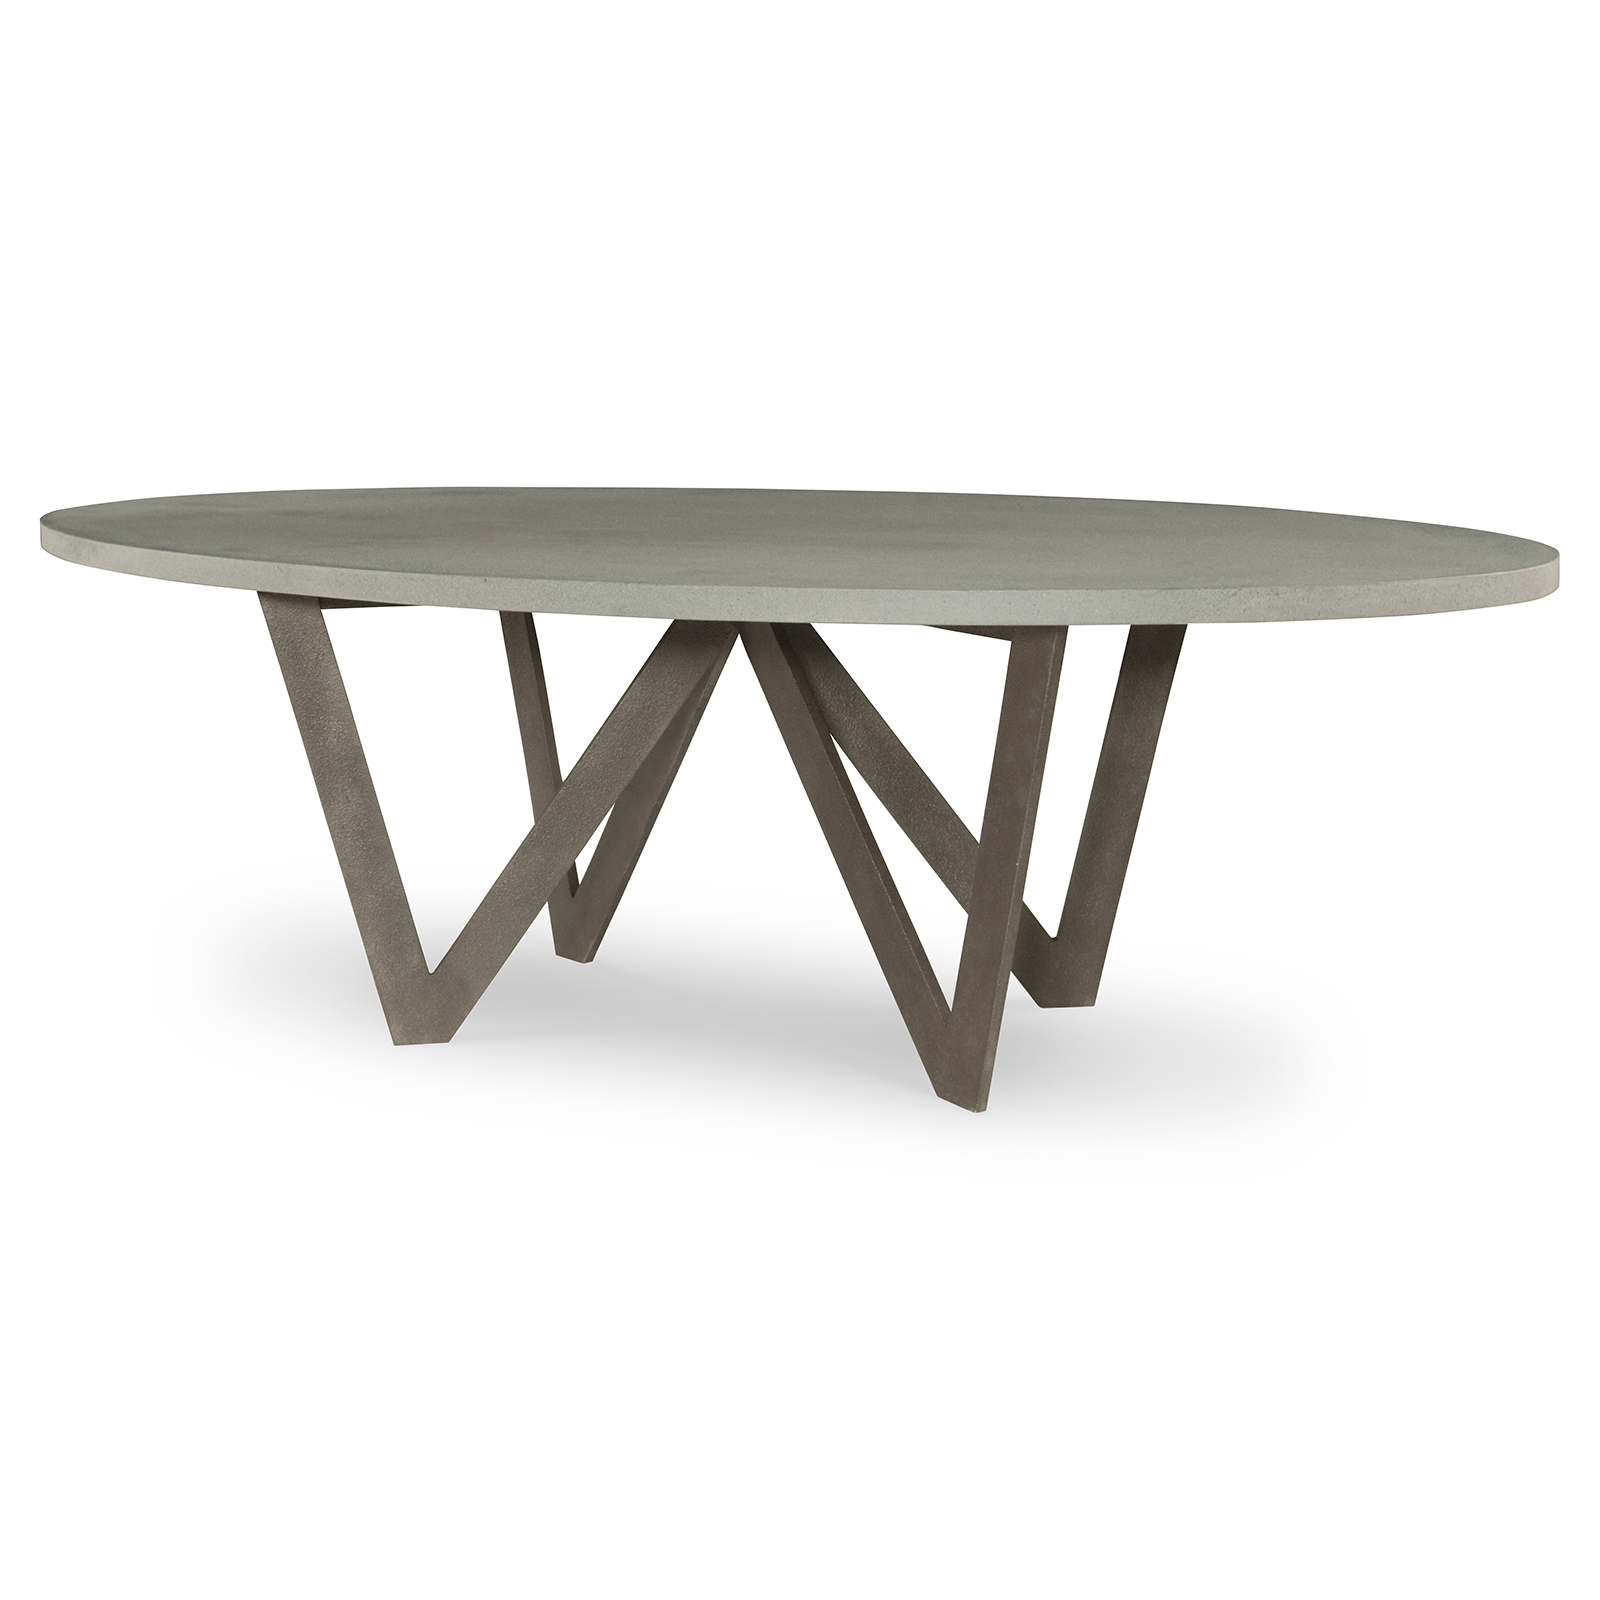 furniture seat of oval decor table metal garden patio design photos